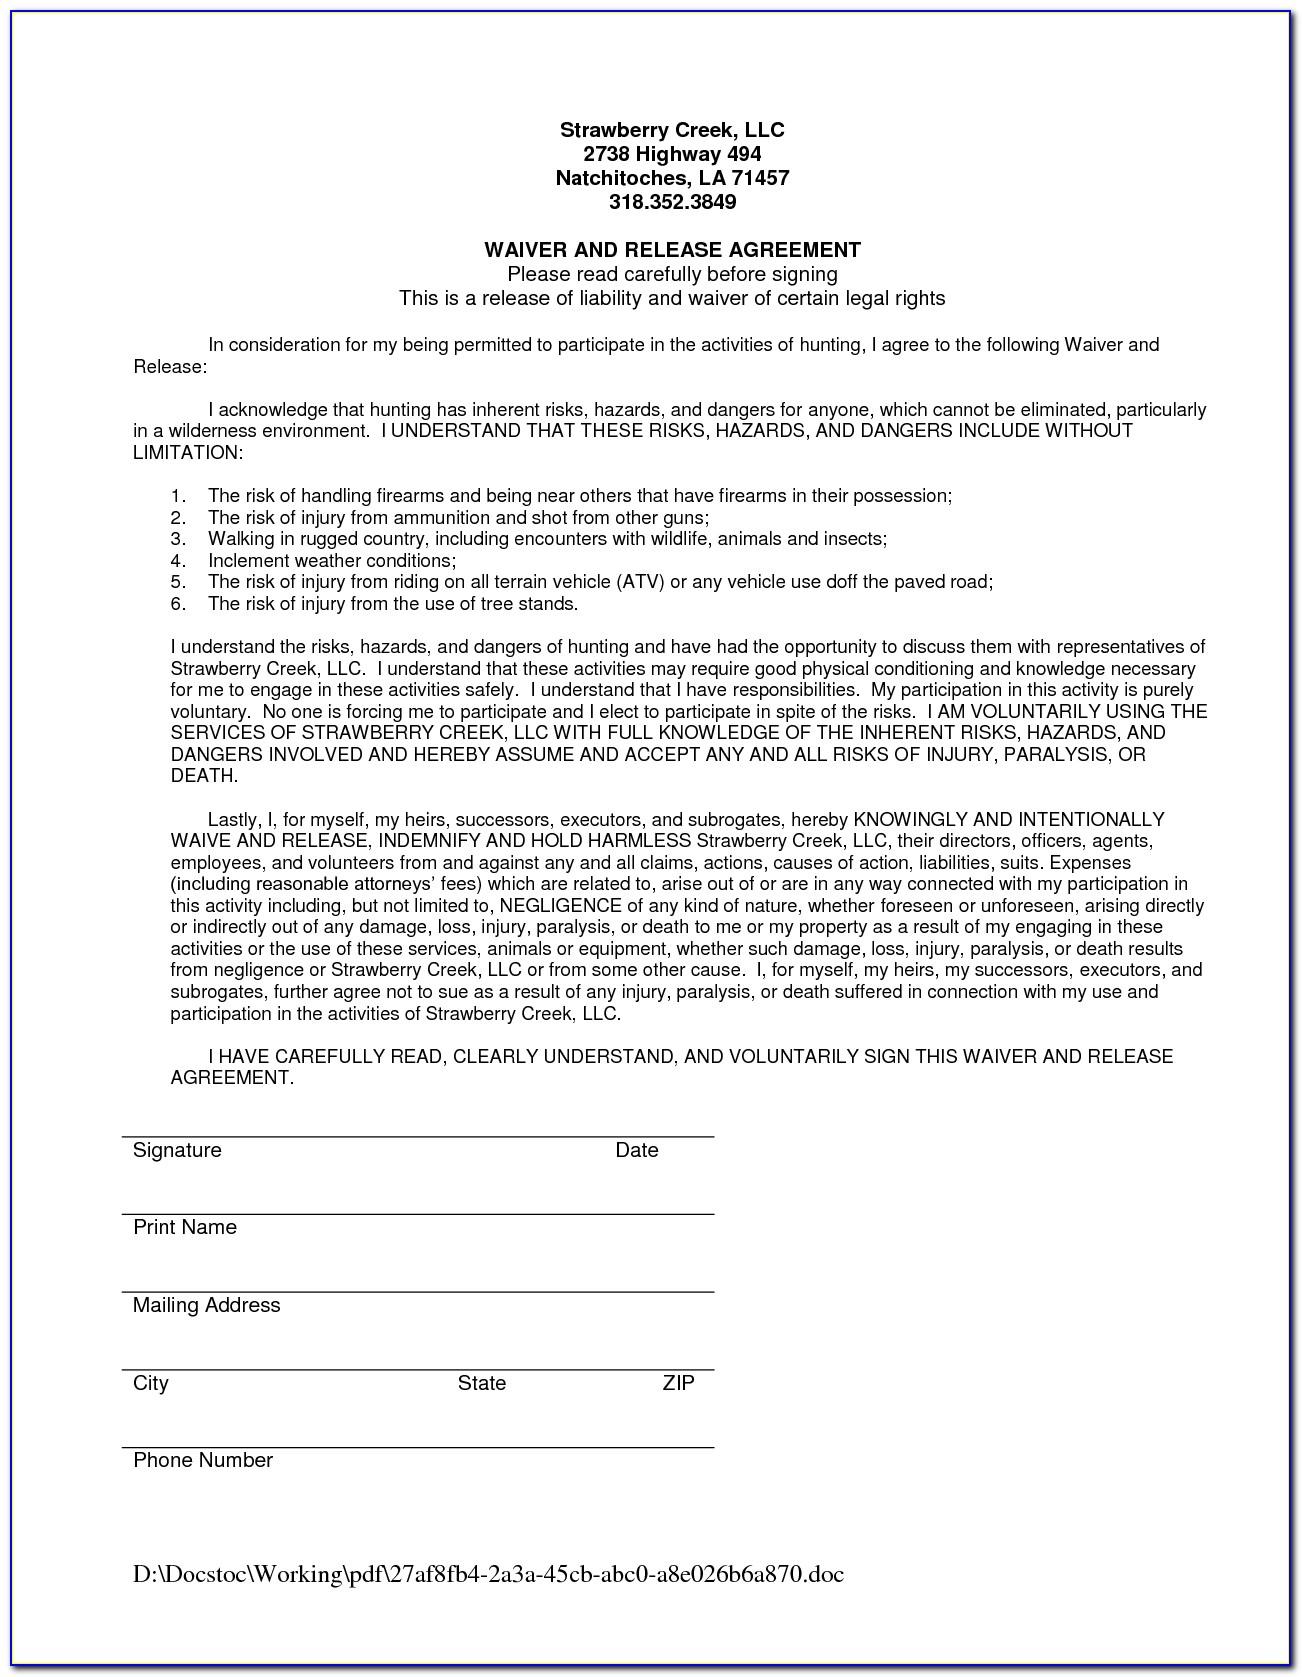 Medicare Advantage Plan Waiver Of Liability Form